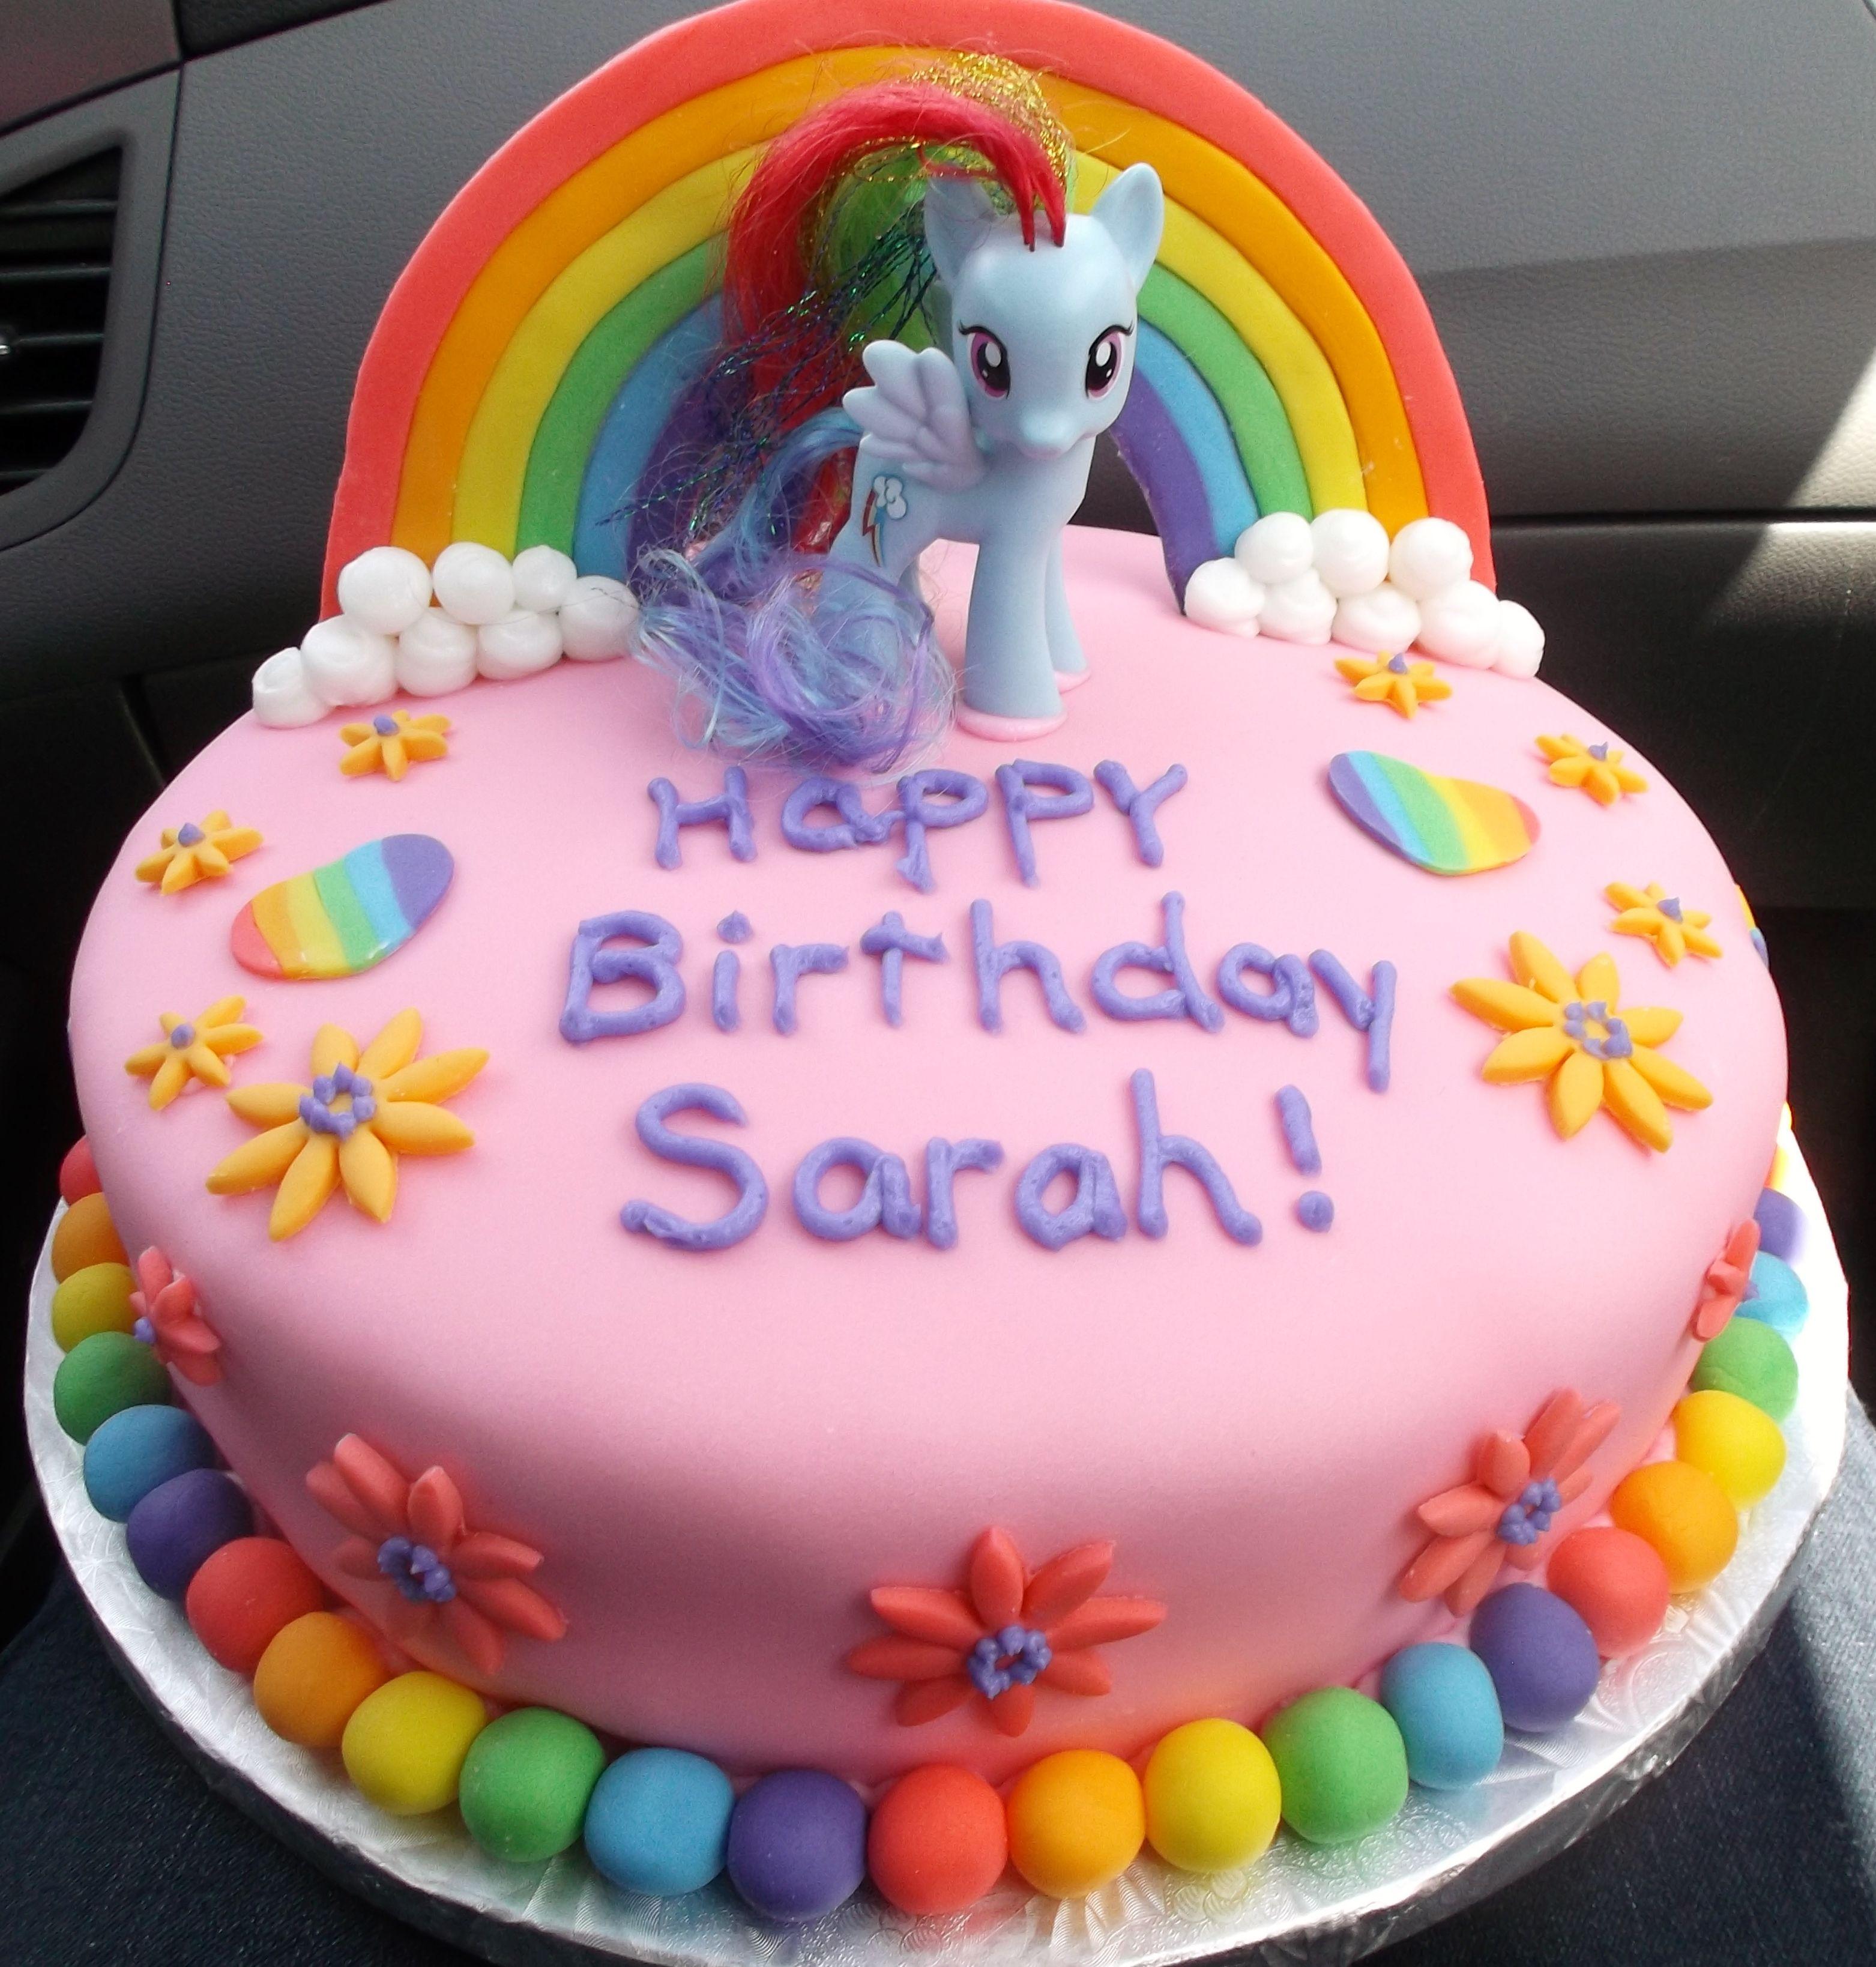 Sarah S My Little Pony Theme Birthday Cake Easy To To Just Stick A Pony On Top Which The Birthday Girl Geburtstagstorte Pony Kuchen Torte Kindergeburtstag